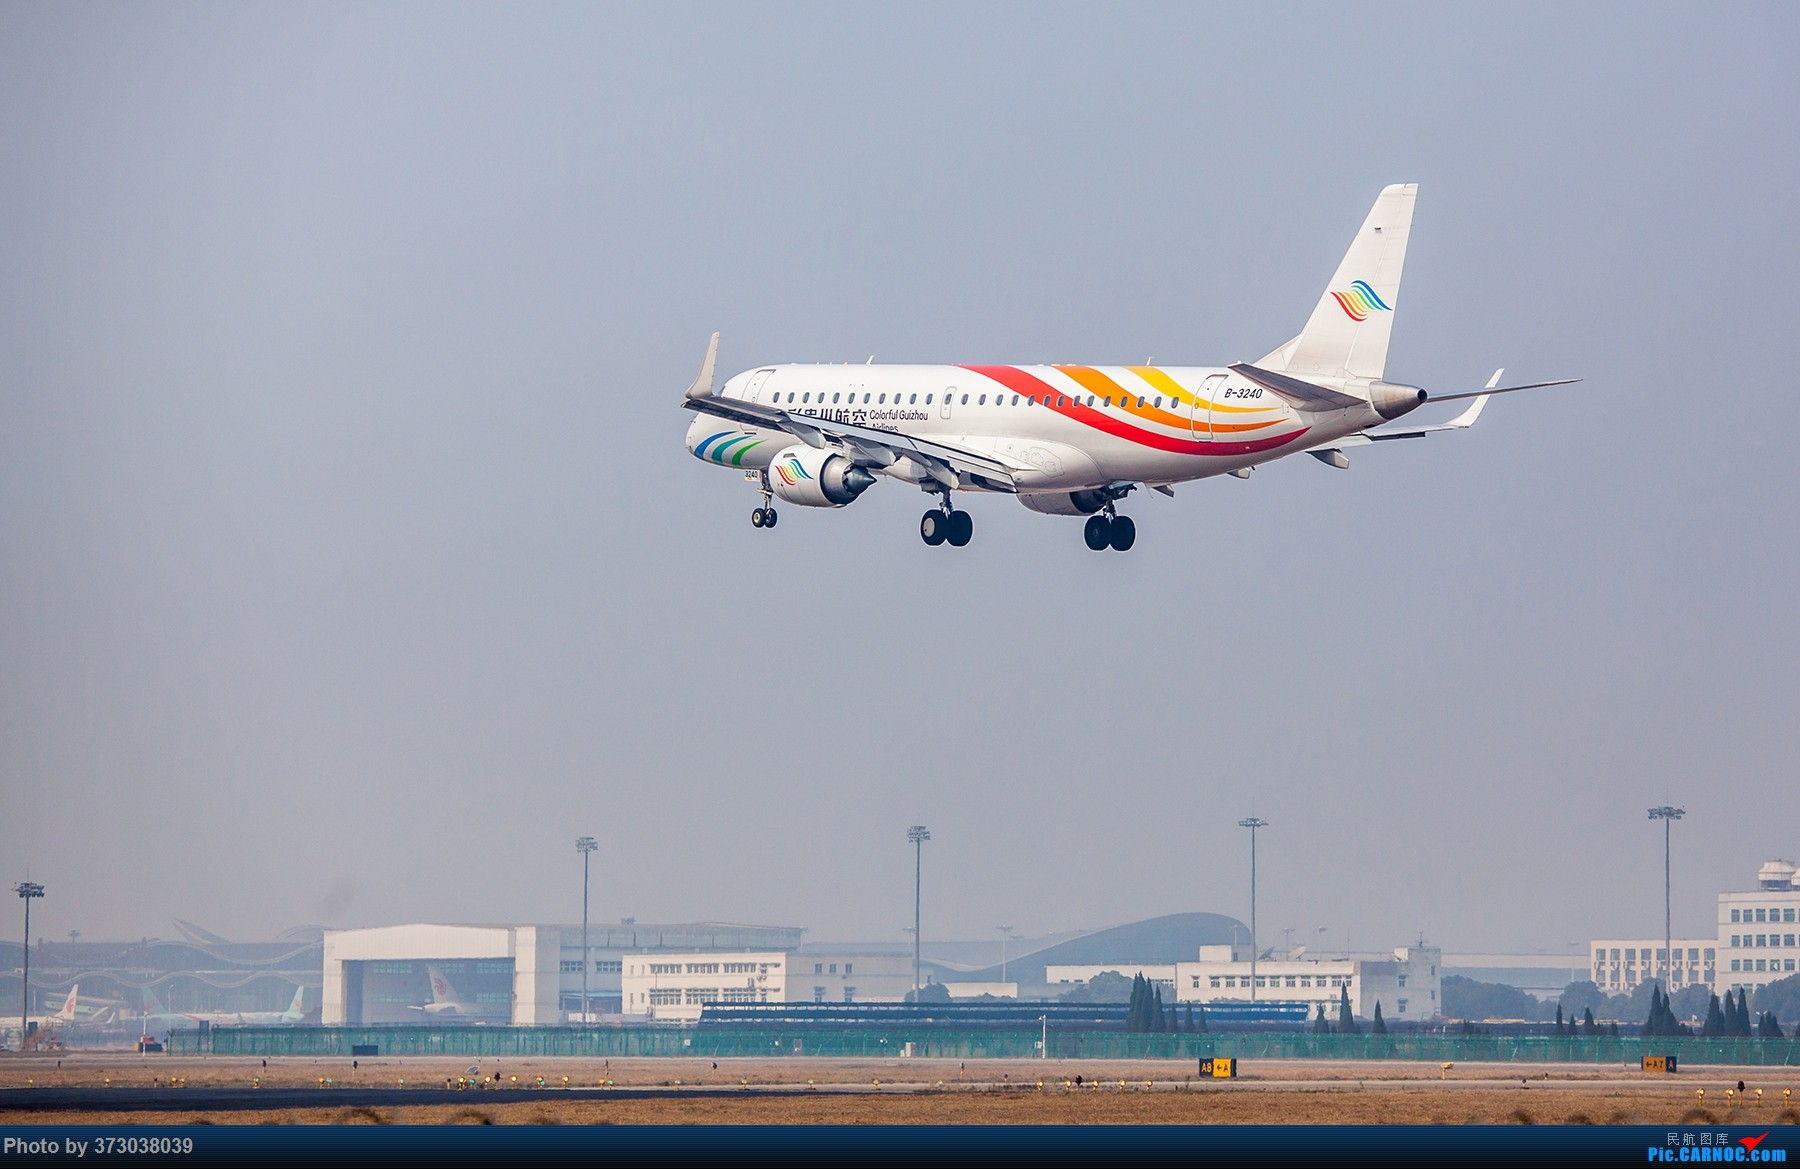 Re:[原创]【杭州飞友会】A320Neo迪士尼杭州萧山机场拍机班门弄斧记 EMBRAER E-190 B-3240 中国杭州萧山国际机场